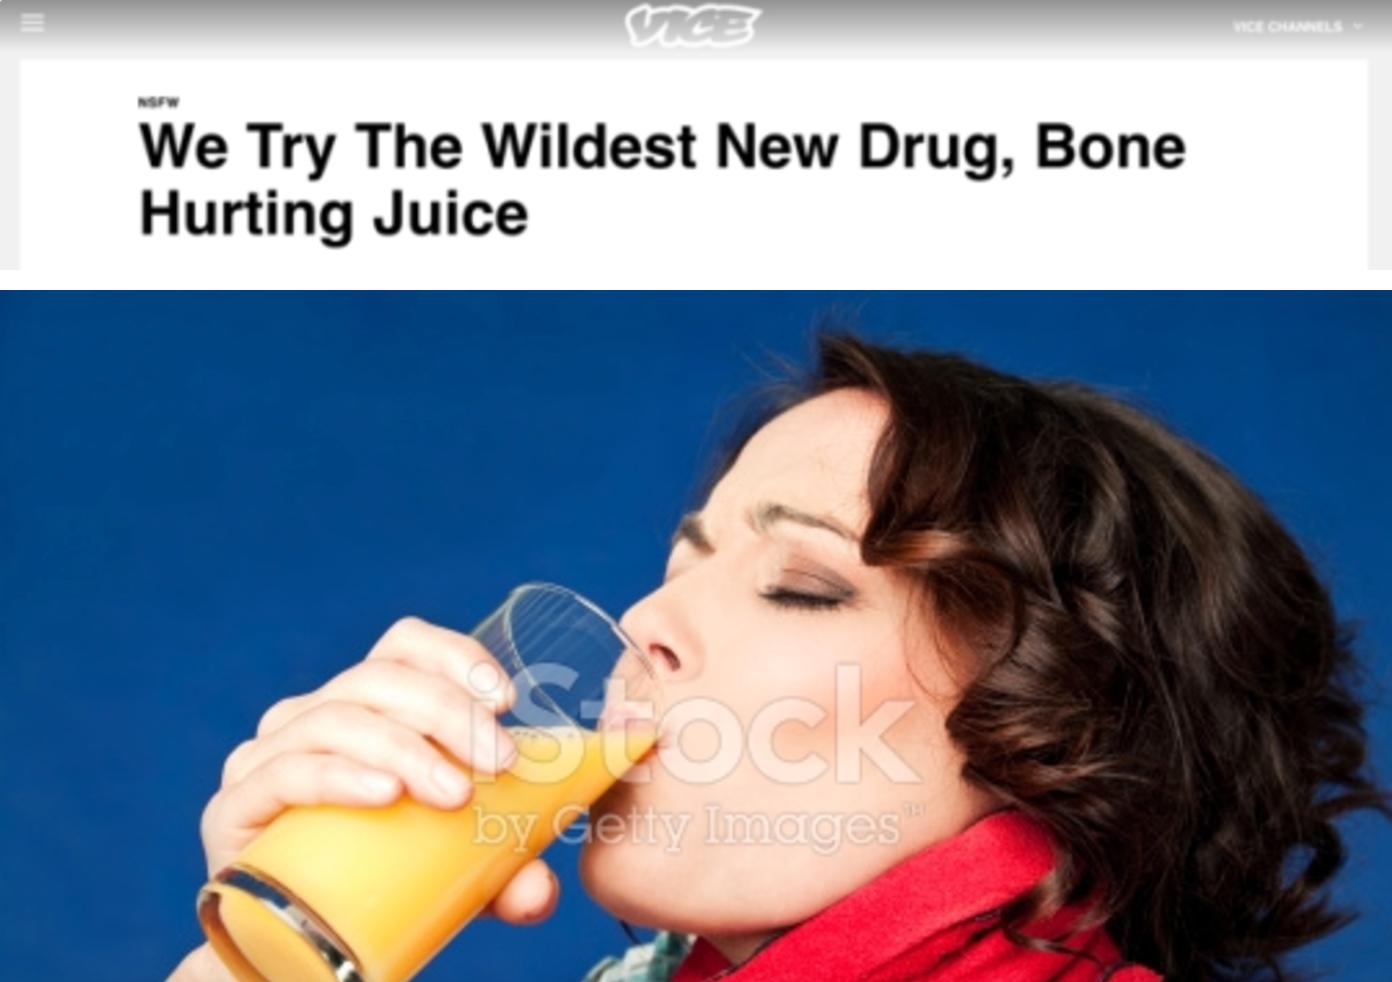 Take A Big Sip Of The New Bone Hurting Juice Meme Gizmodo Australia